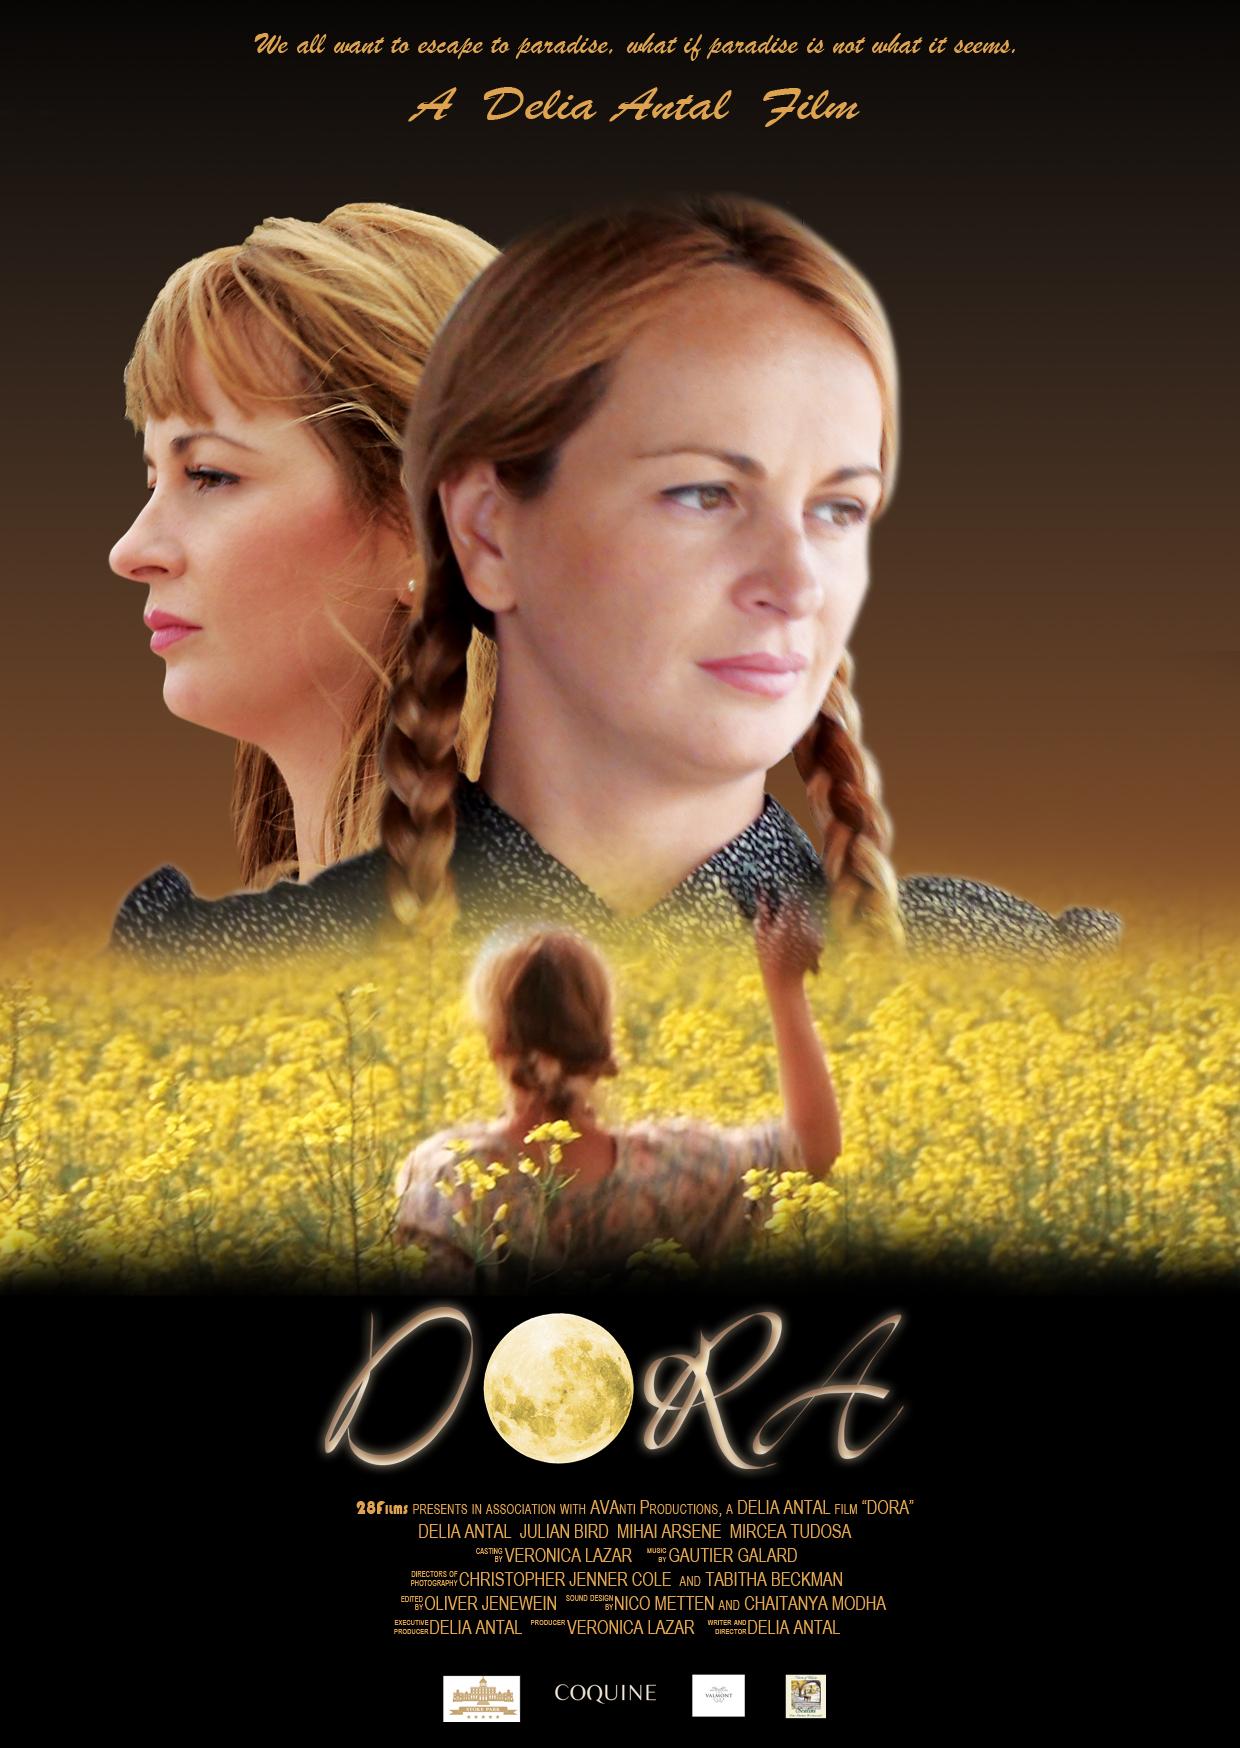 DORA (2011) film poster